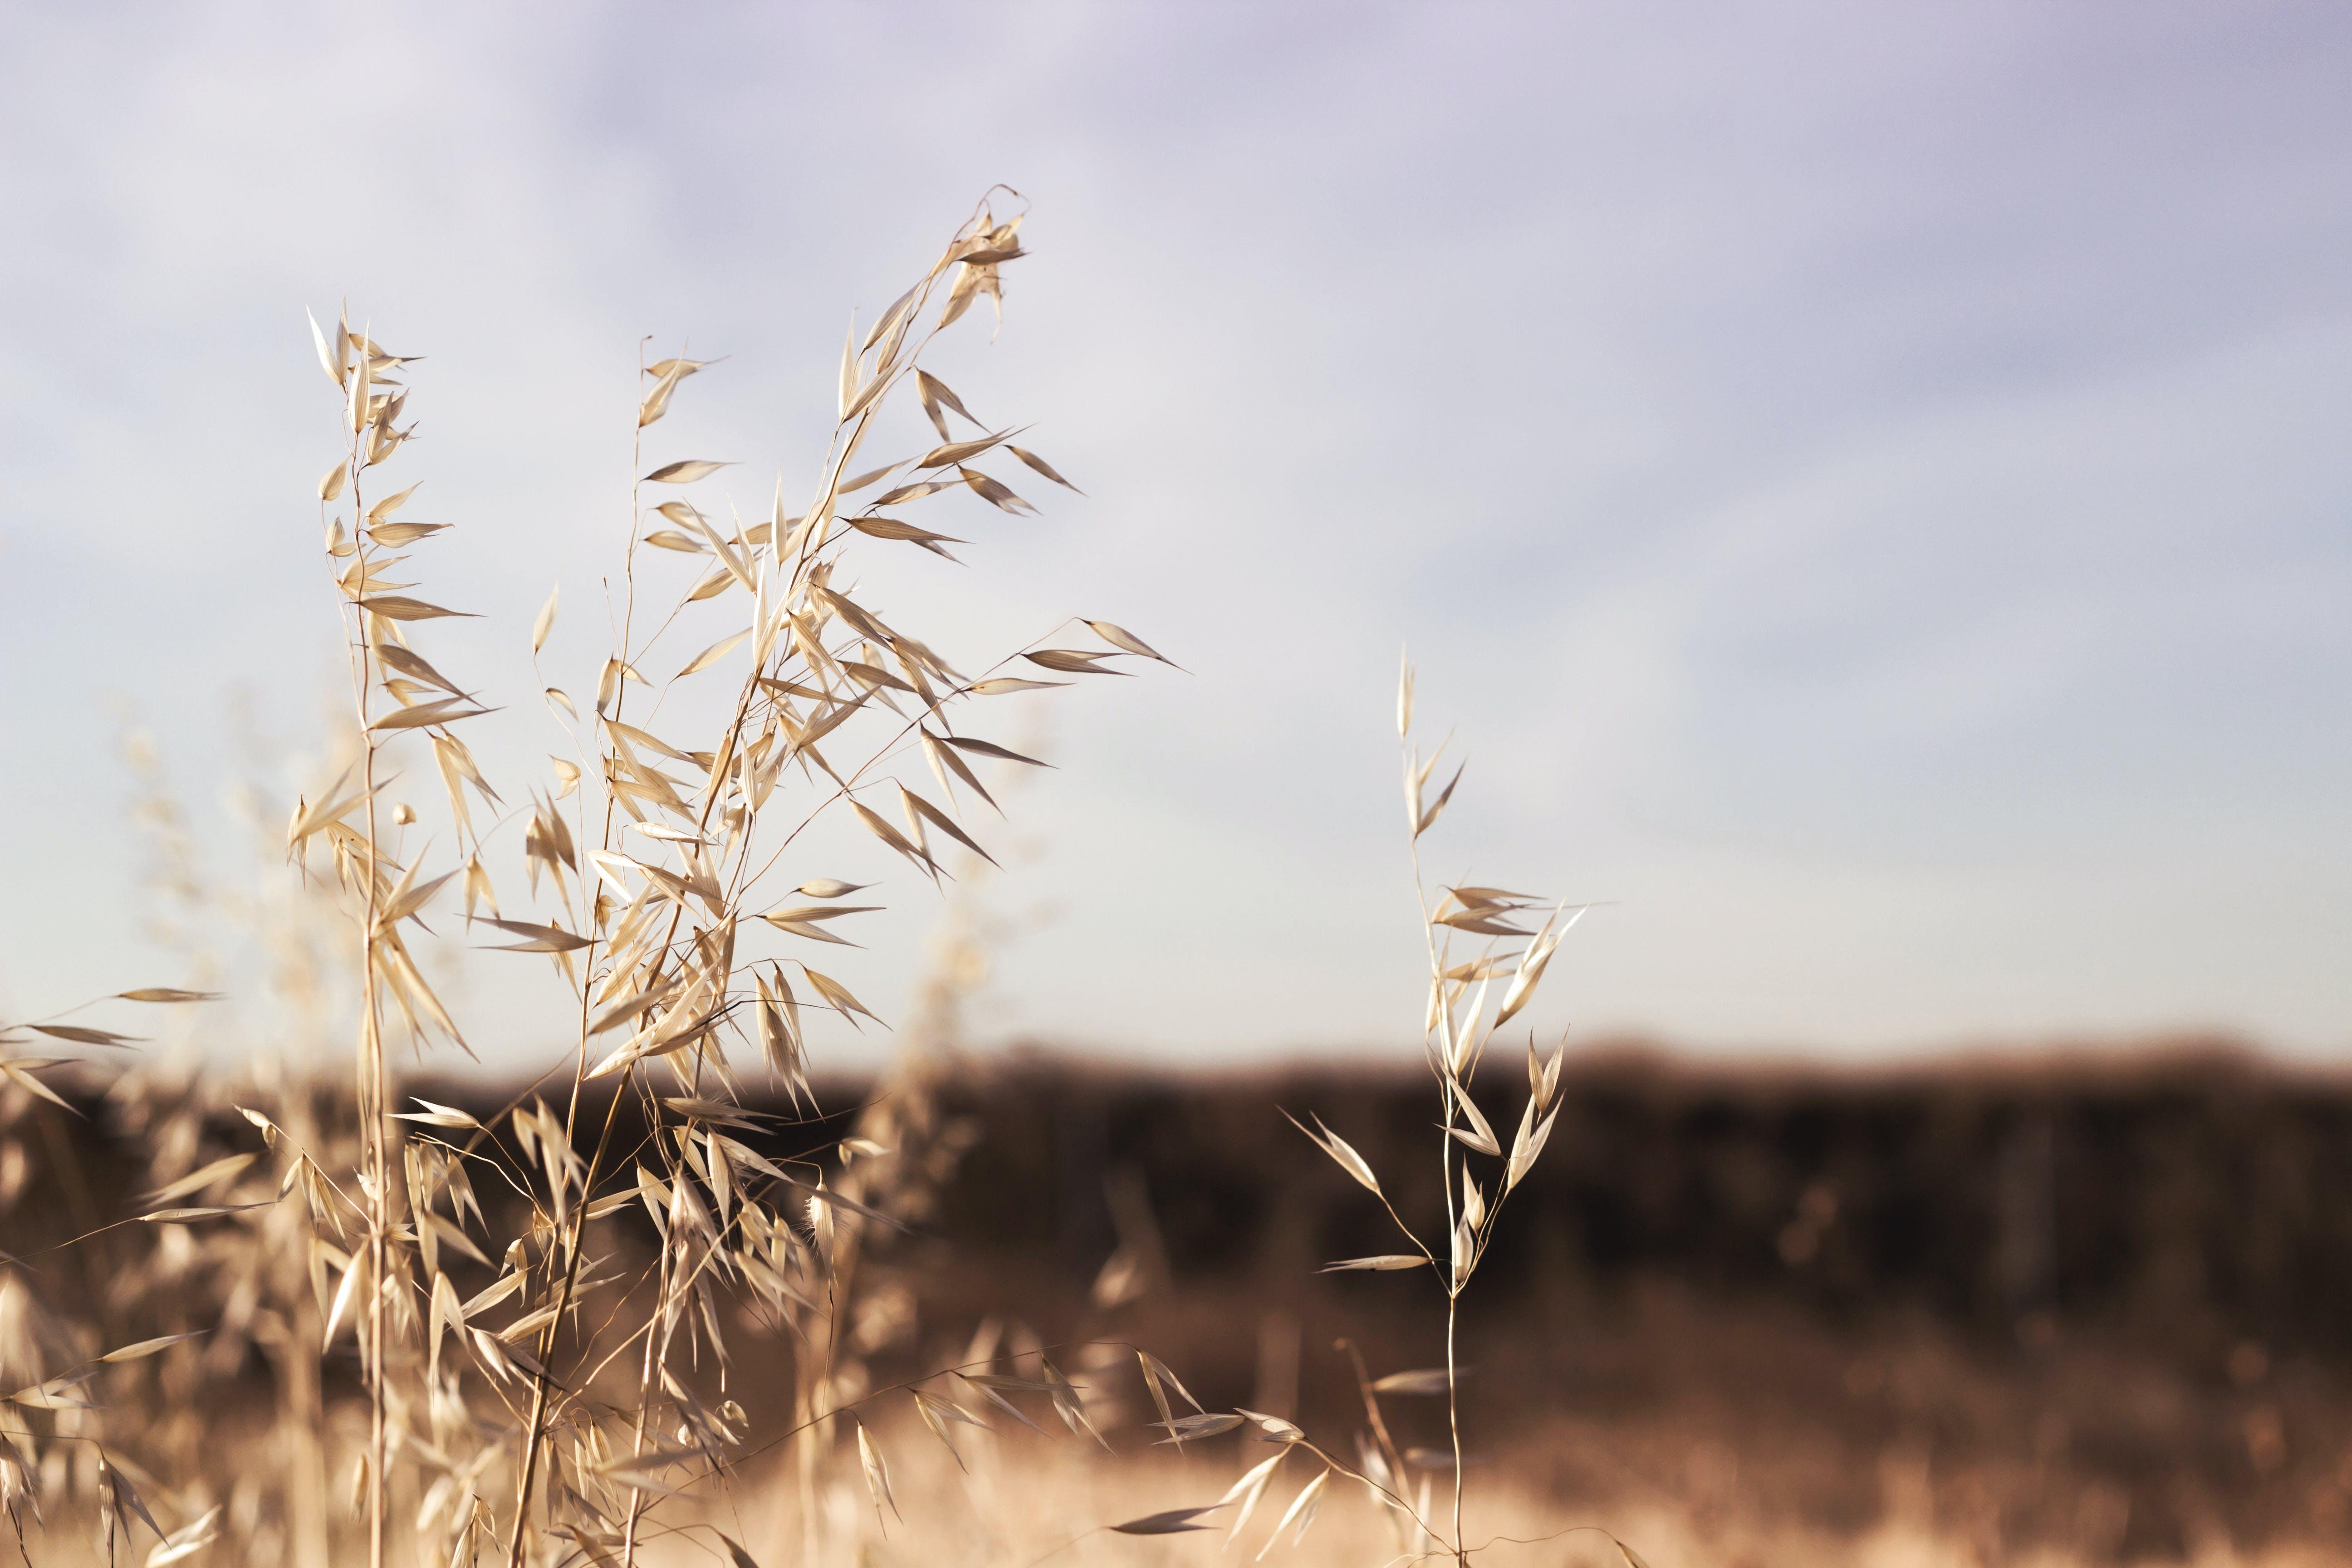 zu himmel, nahansicht, natur, pflanzen